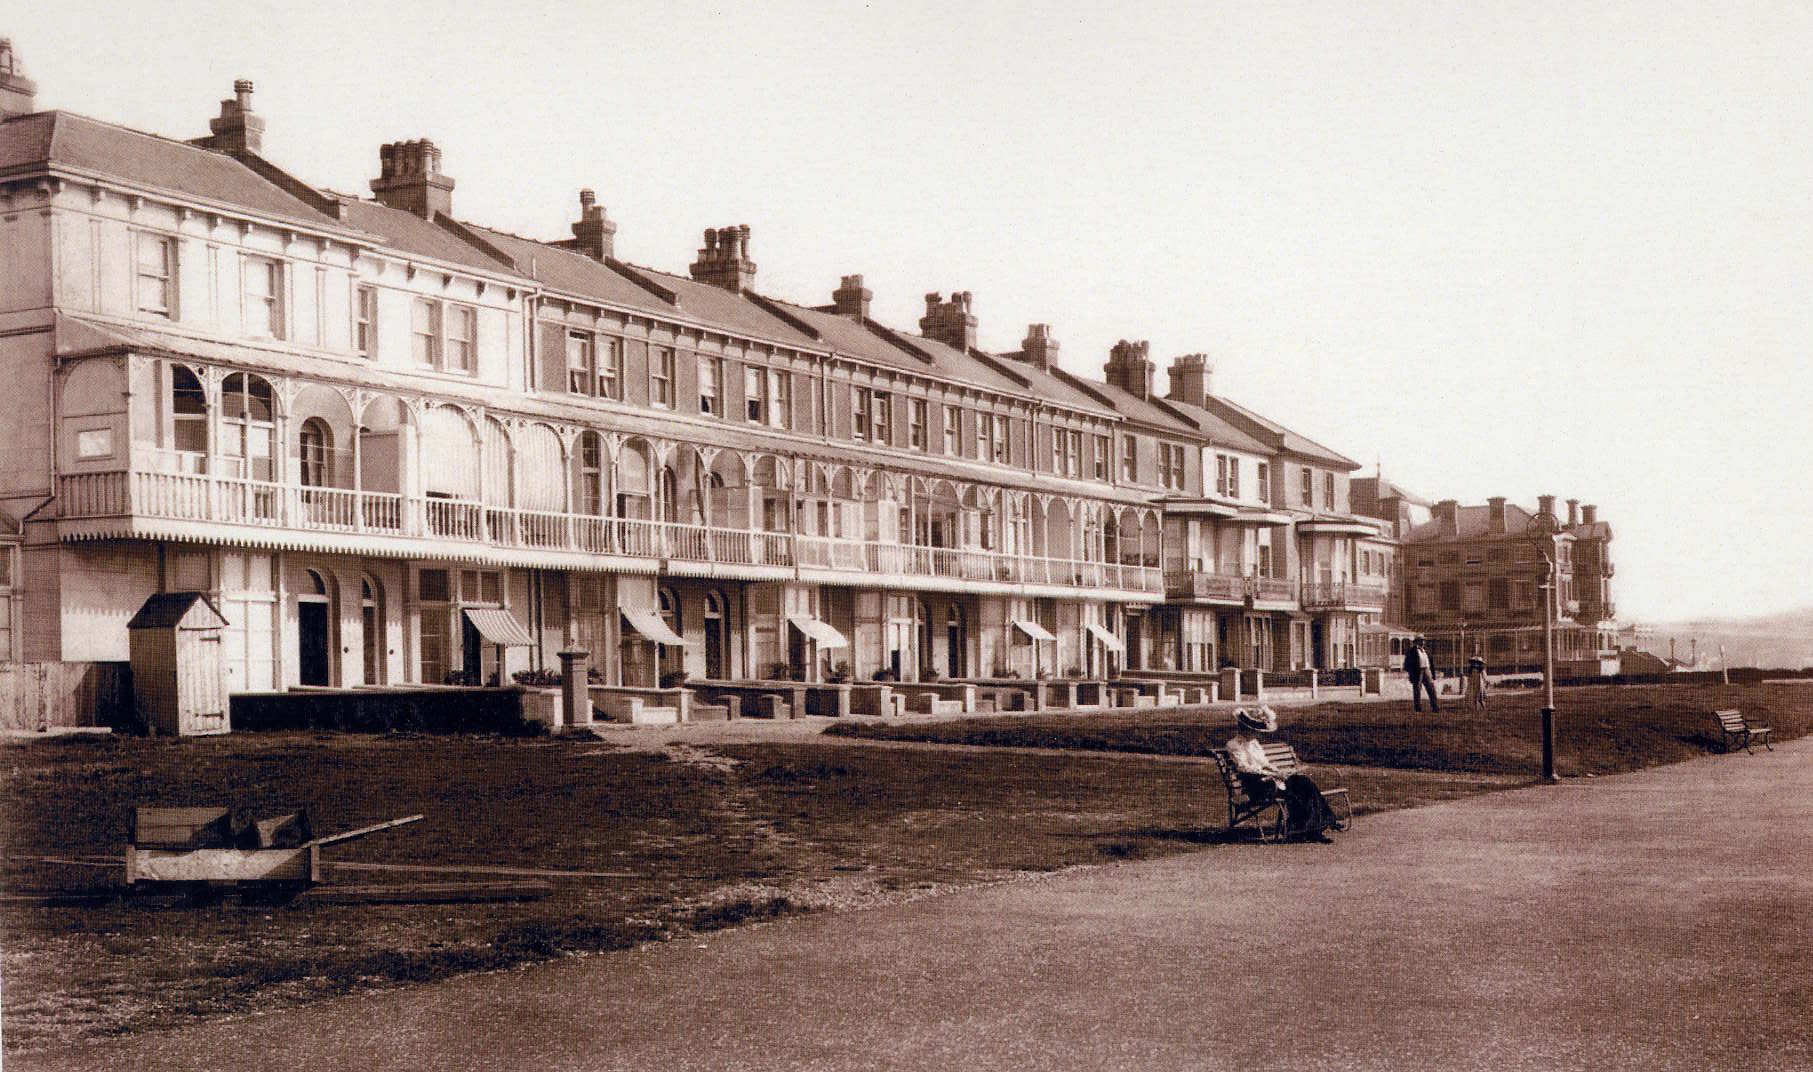 Beaconsfield Terrace, Hythe,Kent